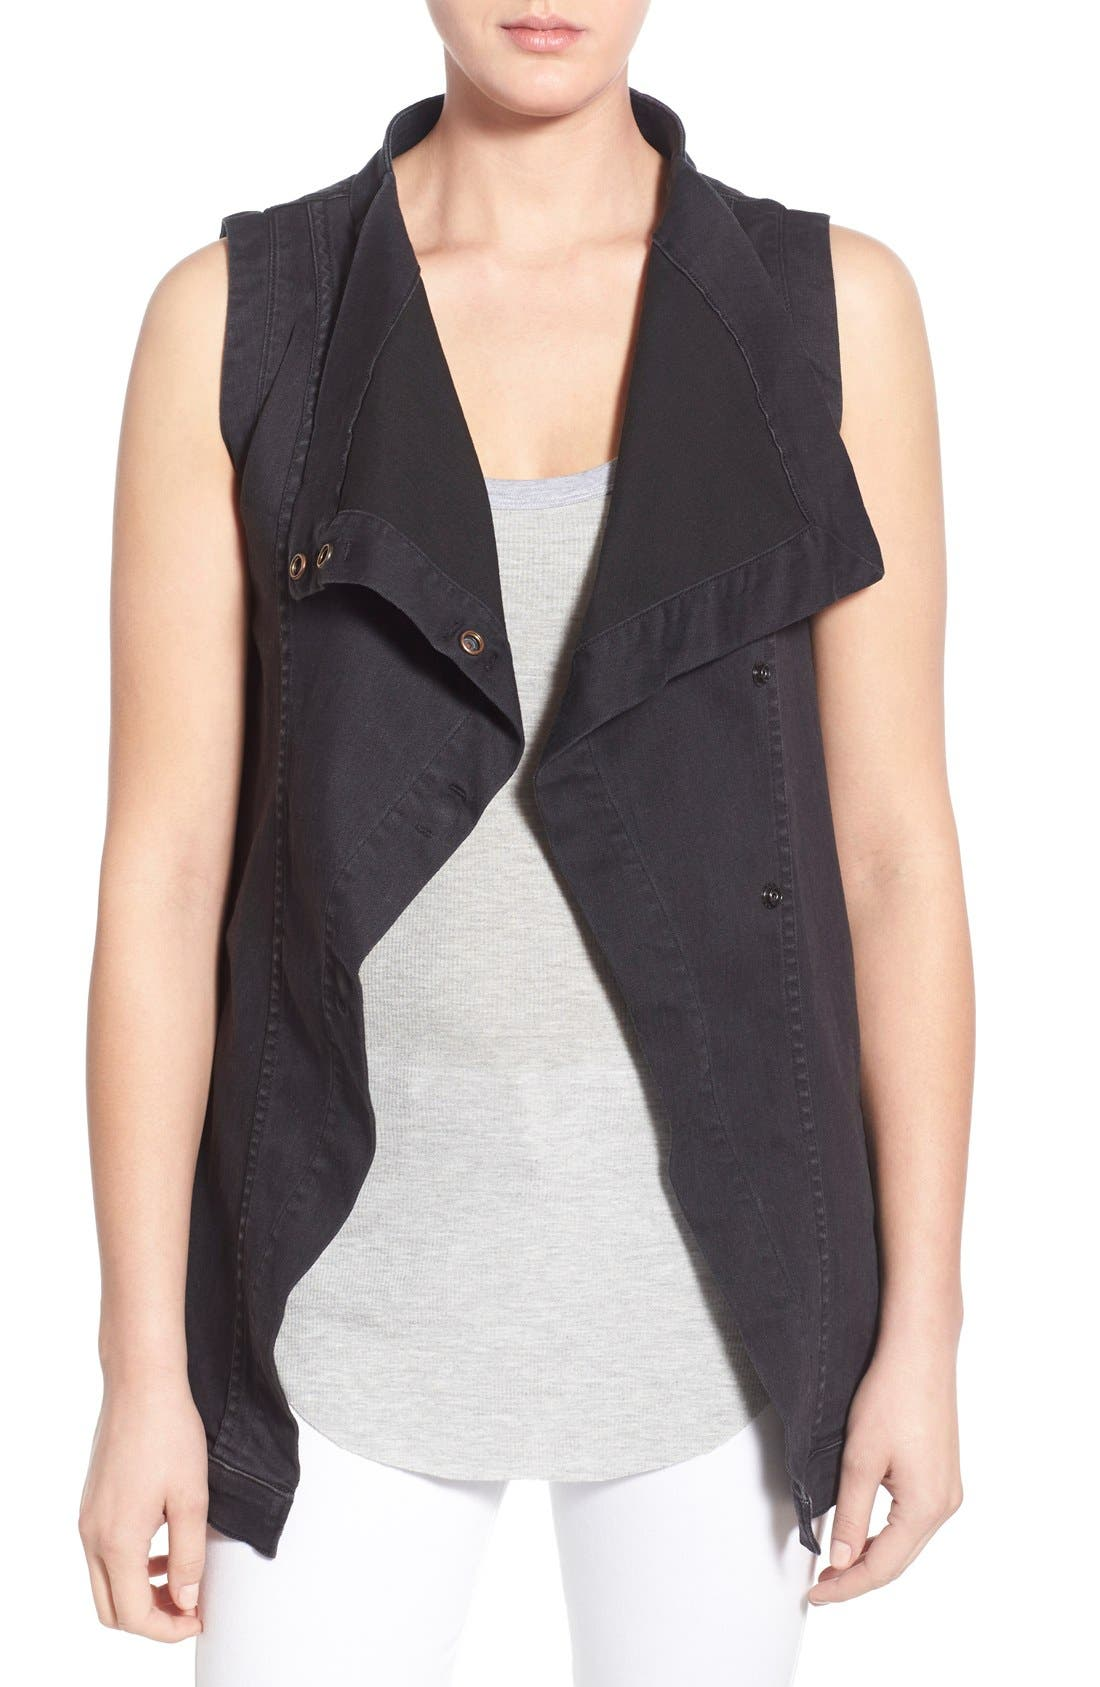 Alternate Image 1 Selected - Fine by Superfine 'Grace' Drape Front Denim Vest